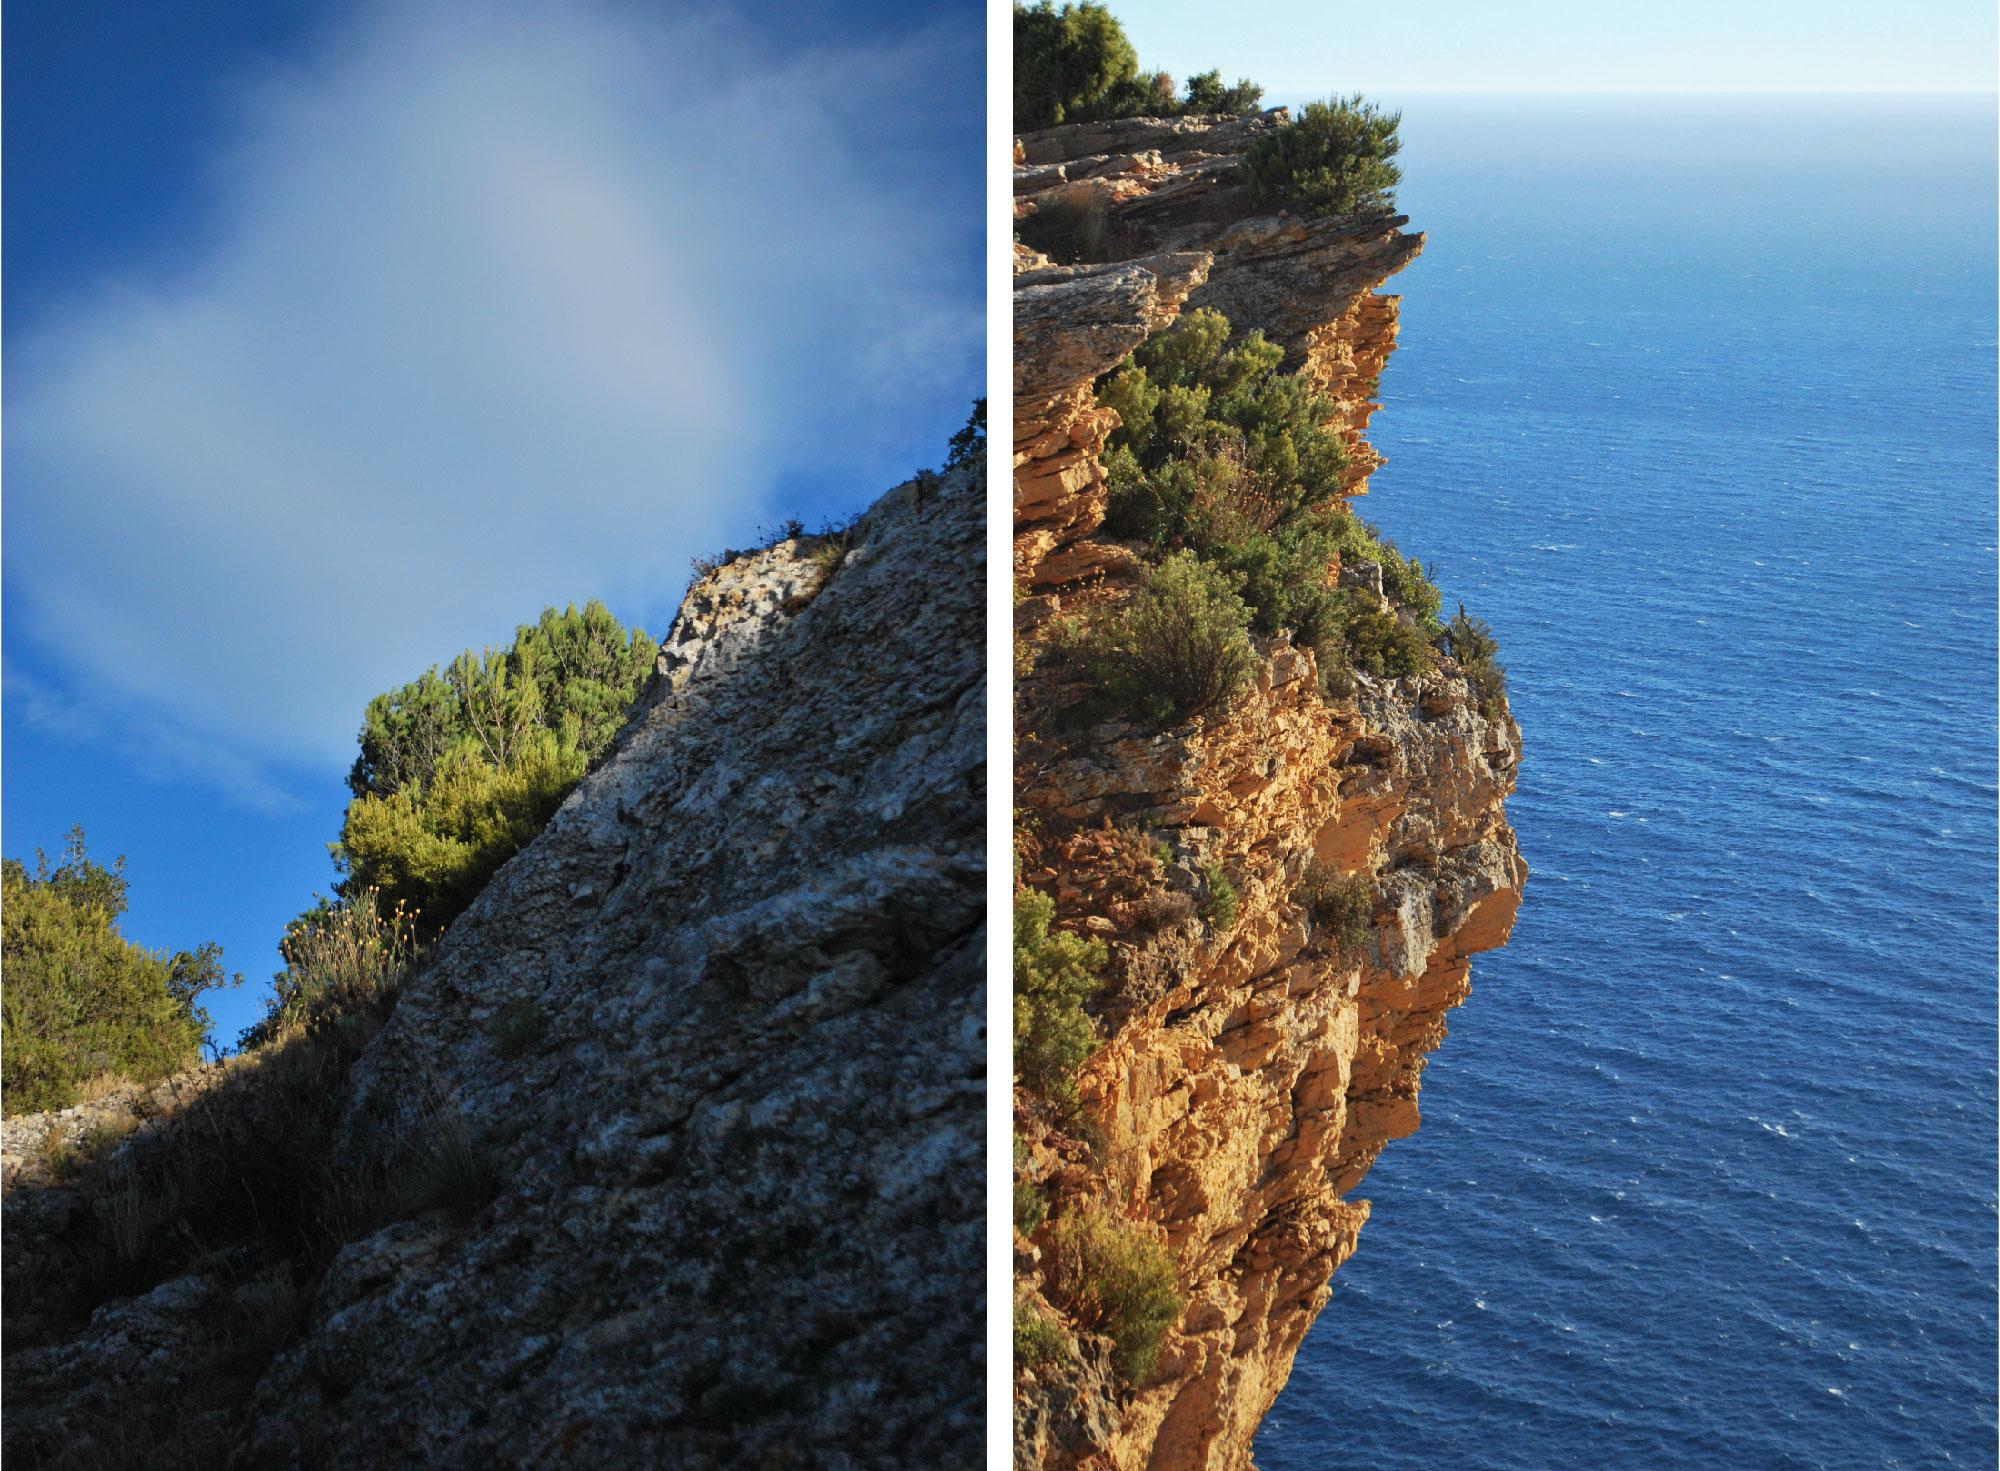 route des cretes roche